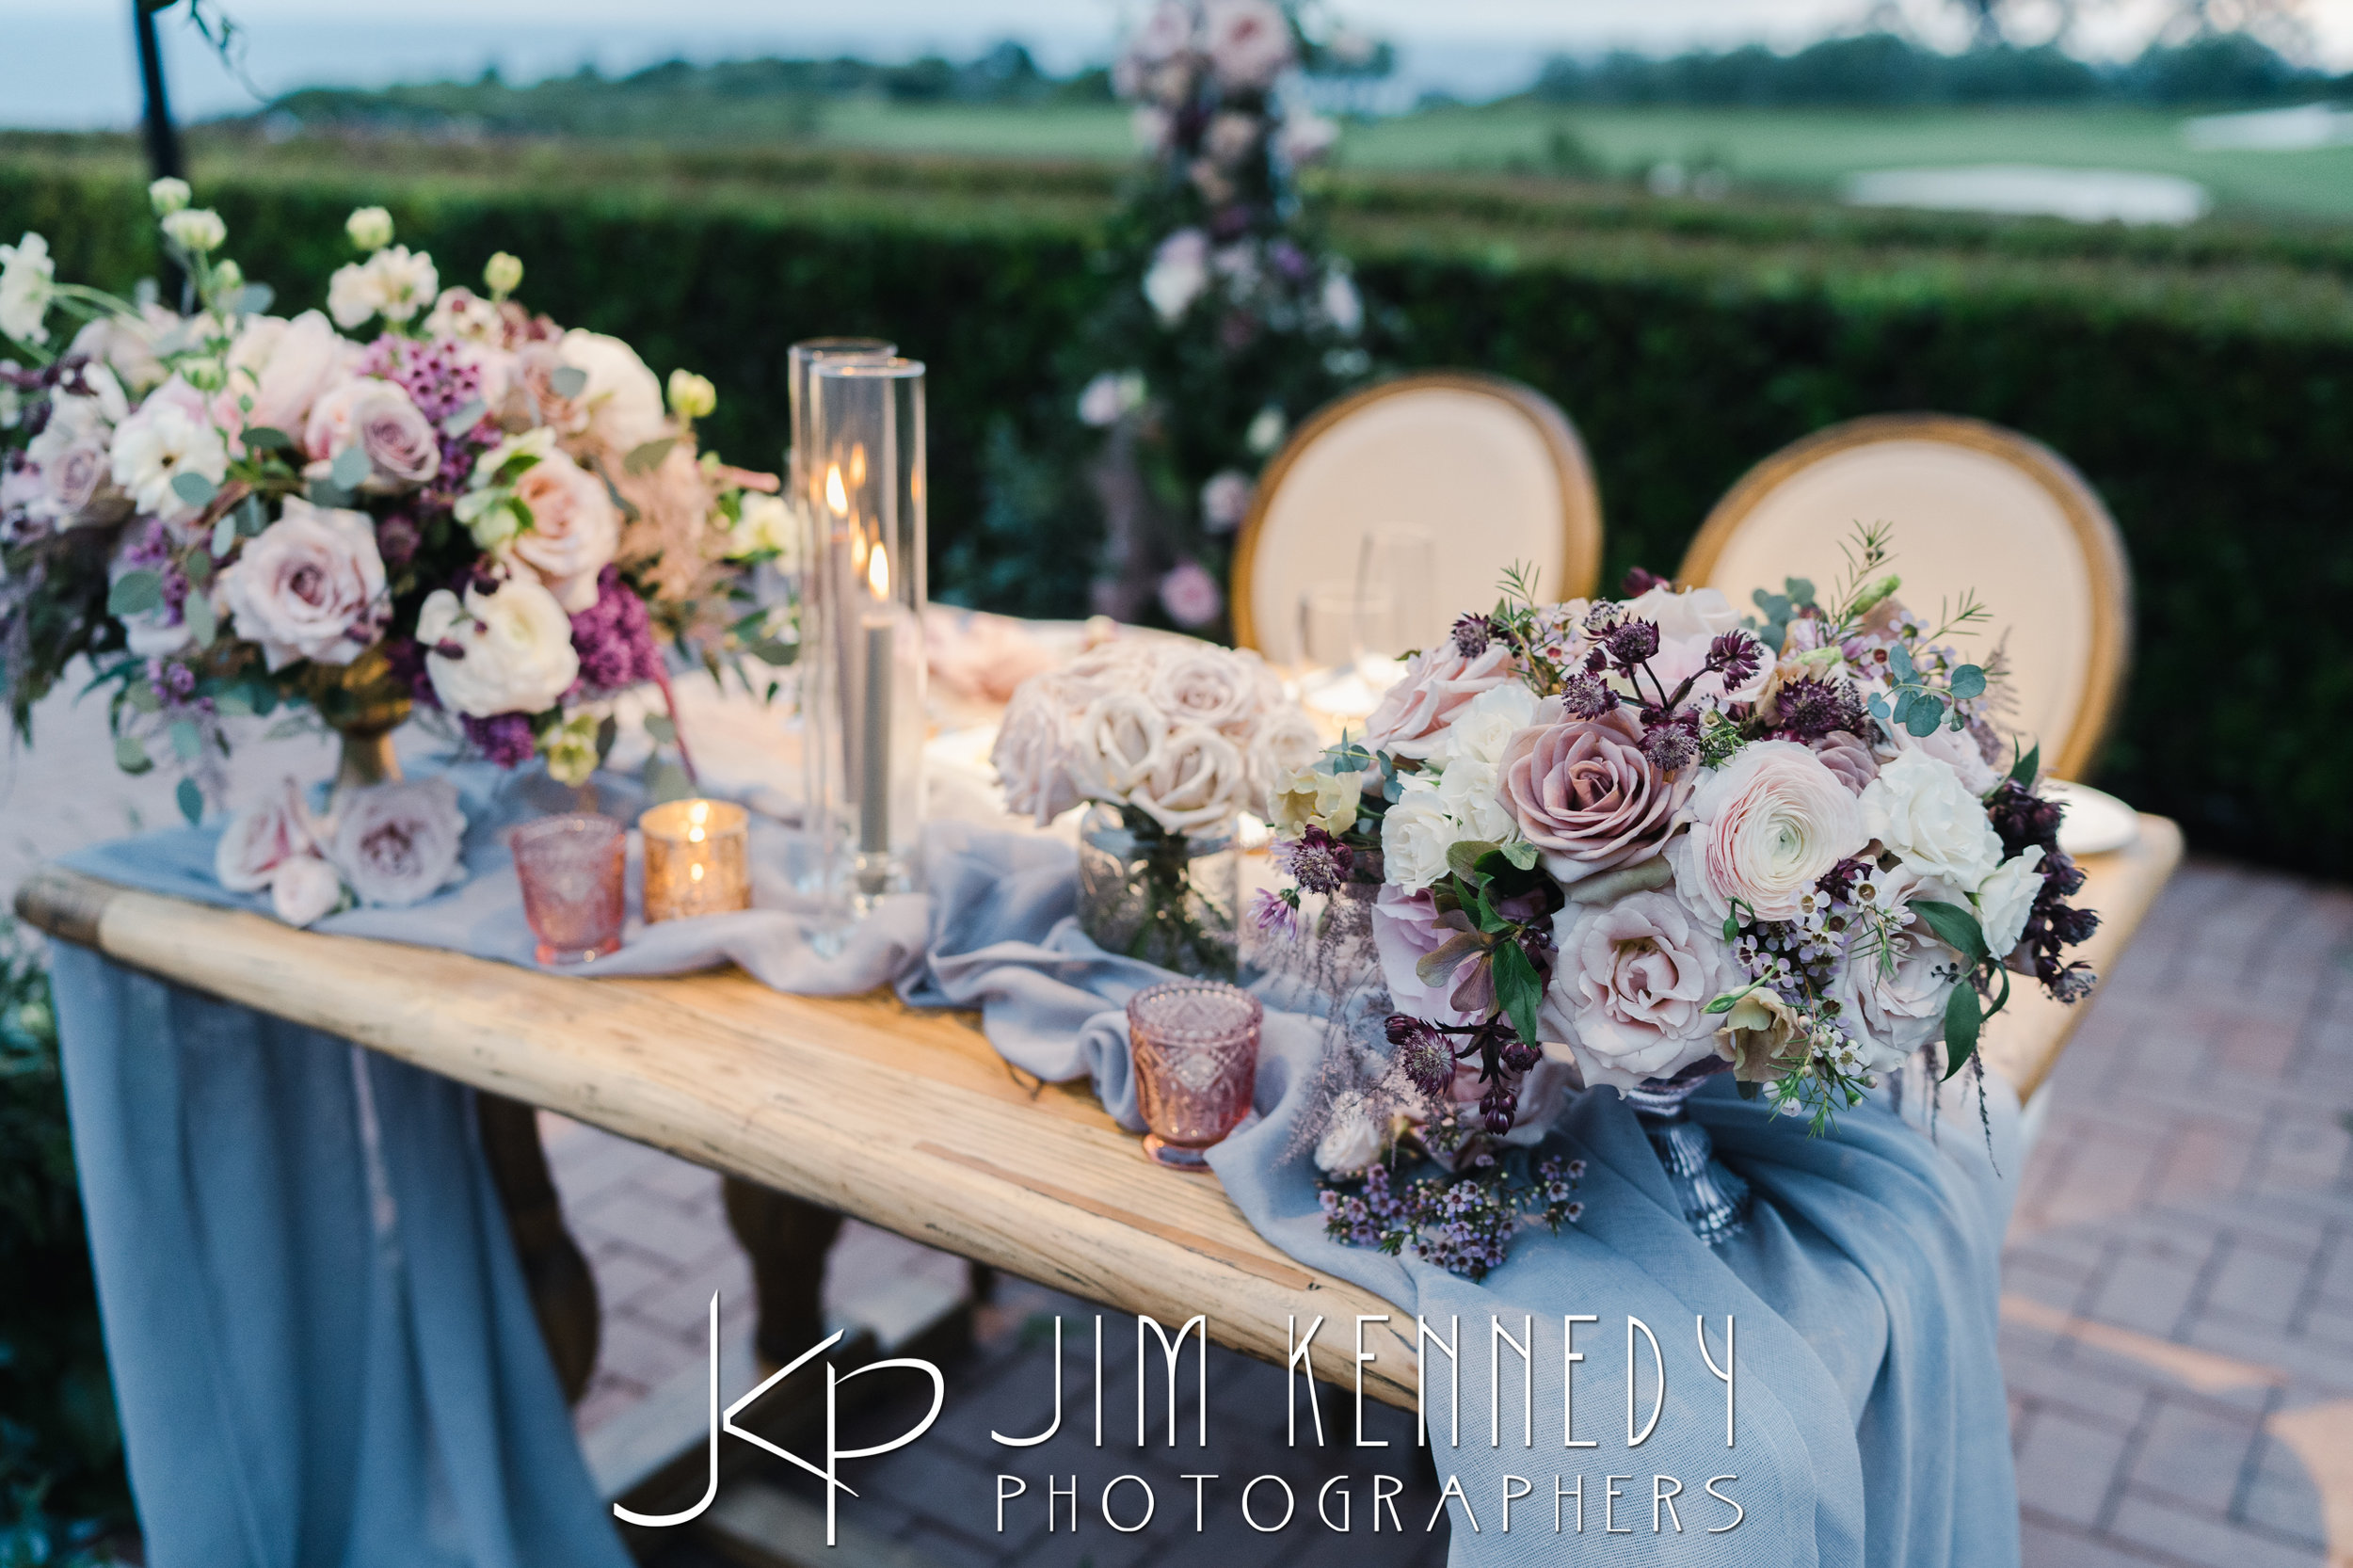 pelican-hill-wedding-jim-kenedy-photographers_0213.JPG